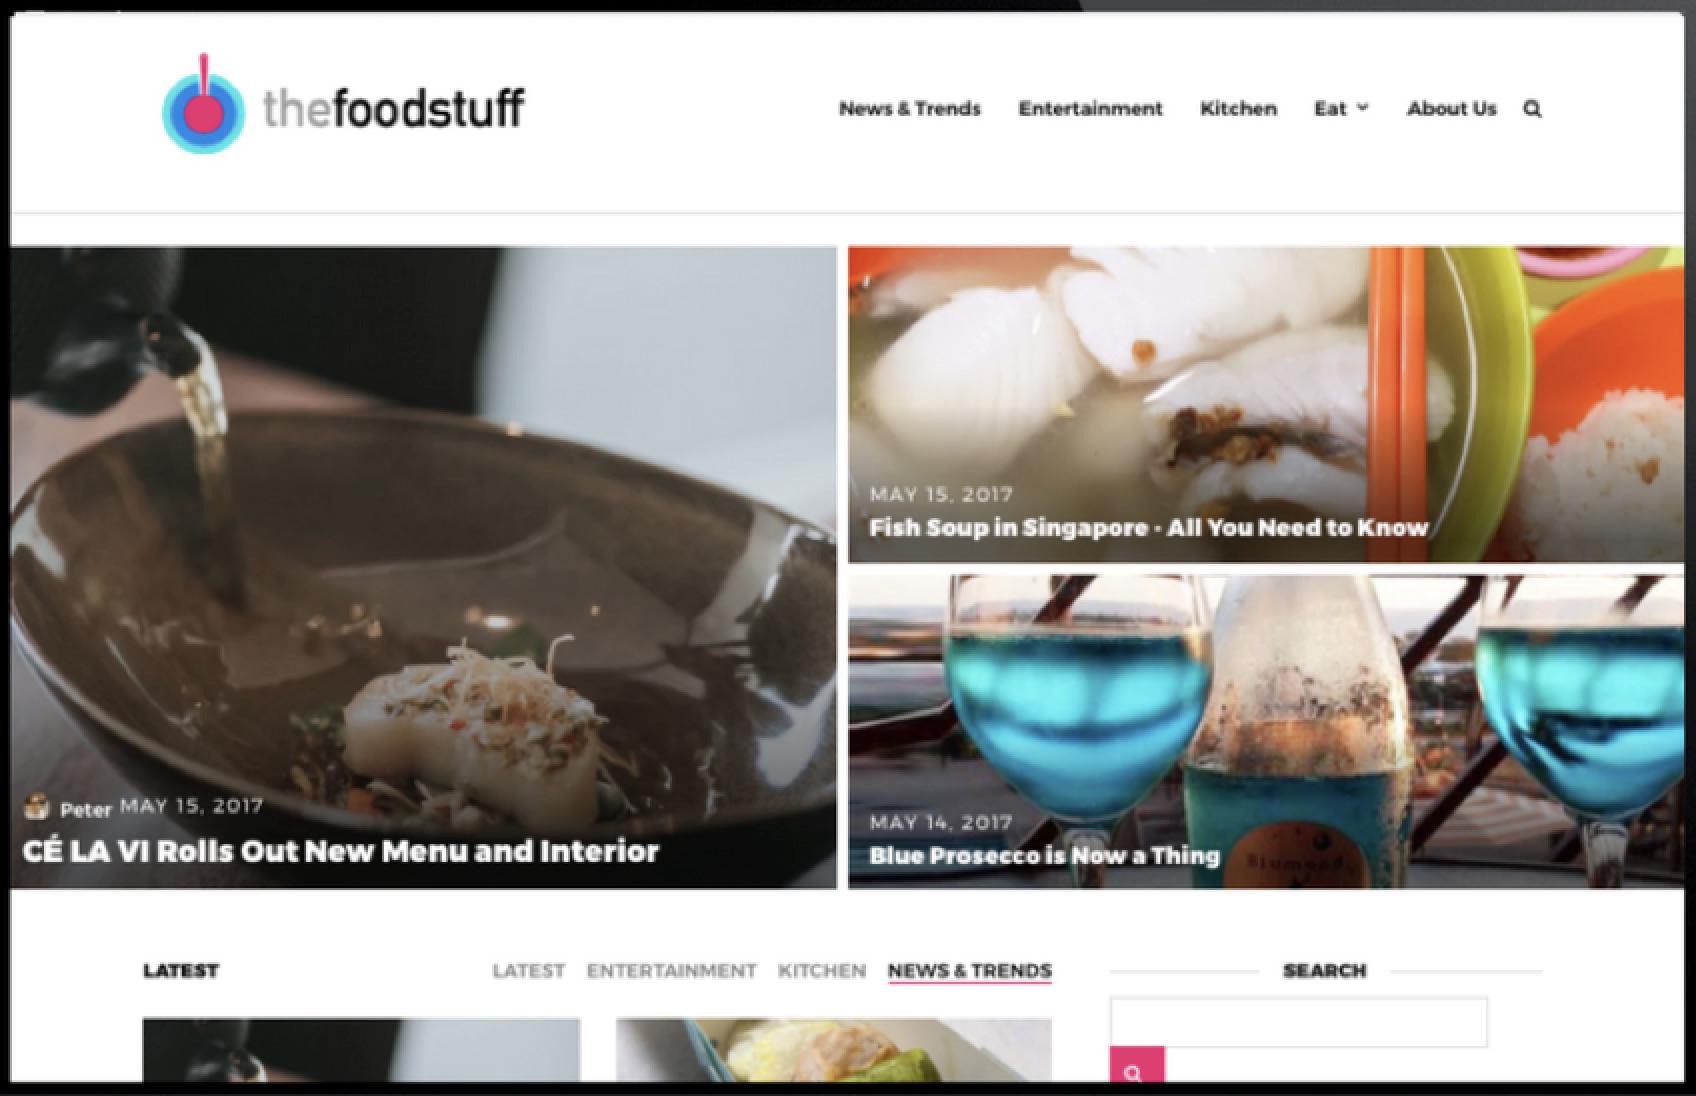 The Foodstuff